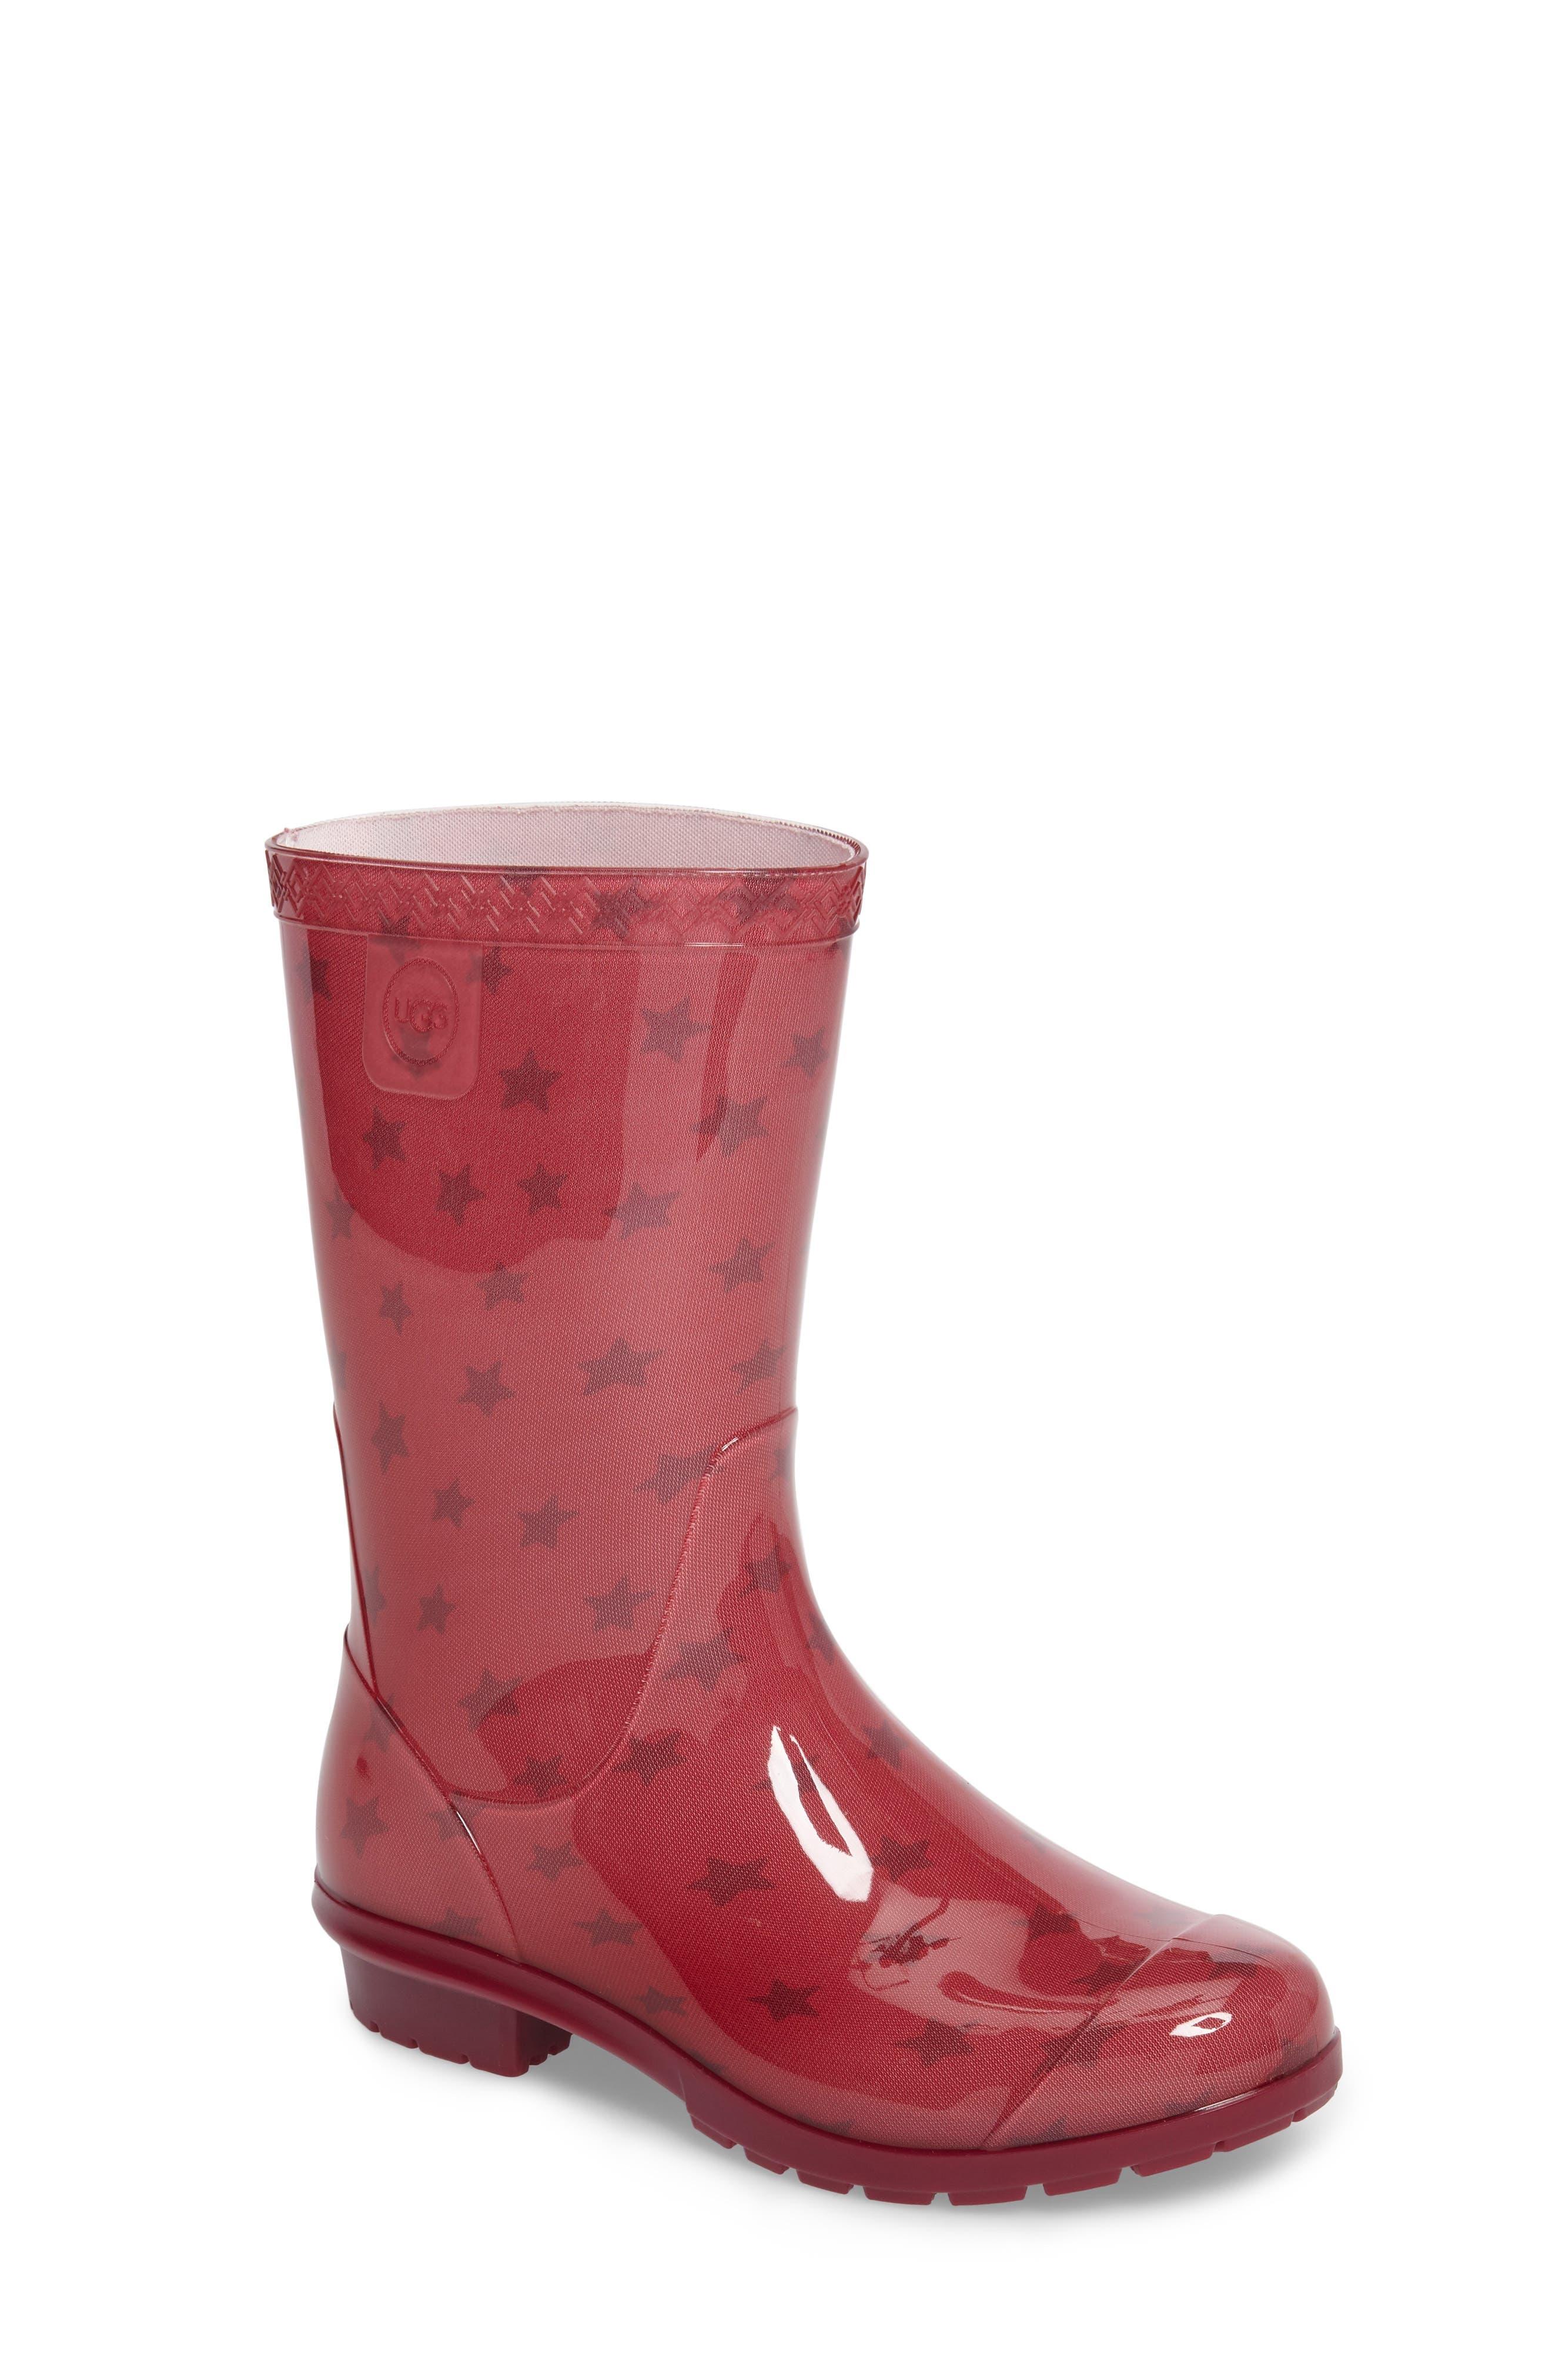 Alternate Image 1 Selected - UGG® Raana Stars Waterproof Rain Boot (Little Kid & Big Kid)